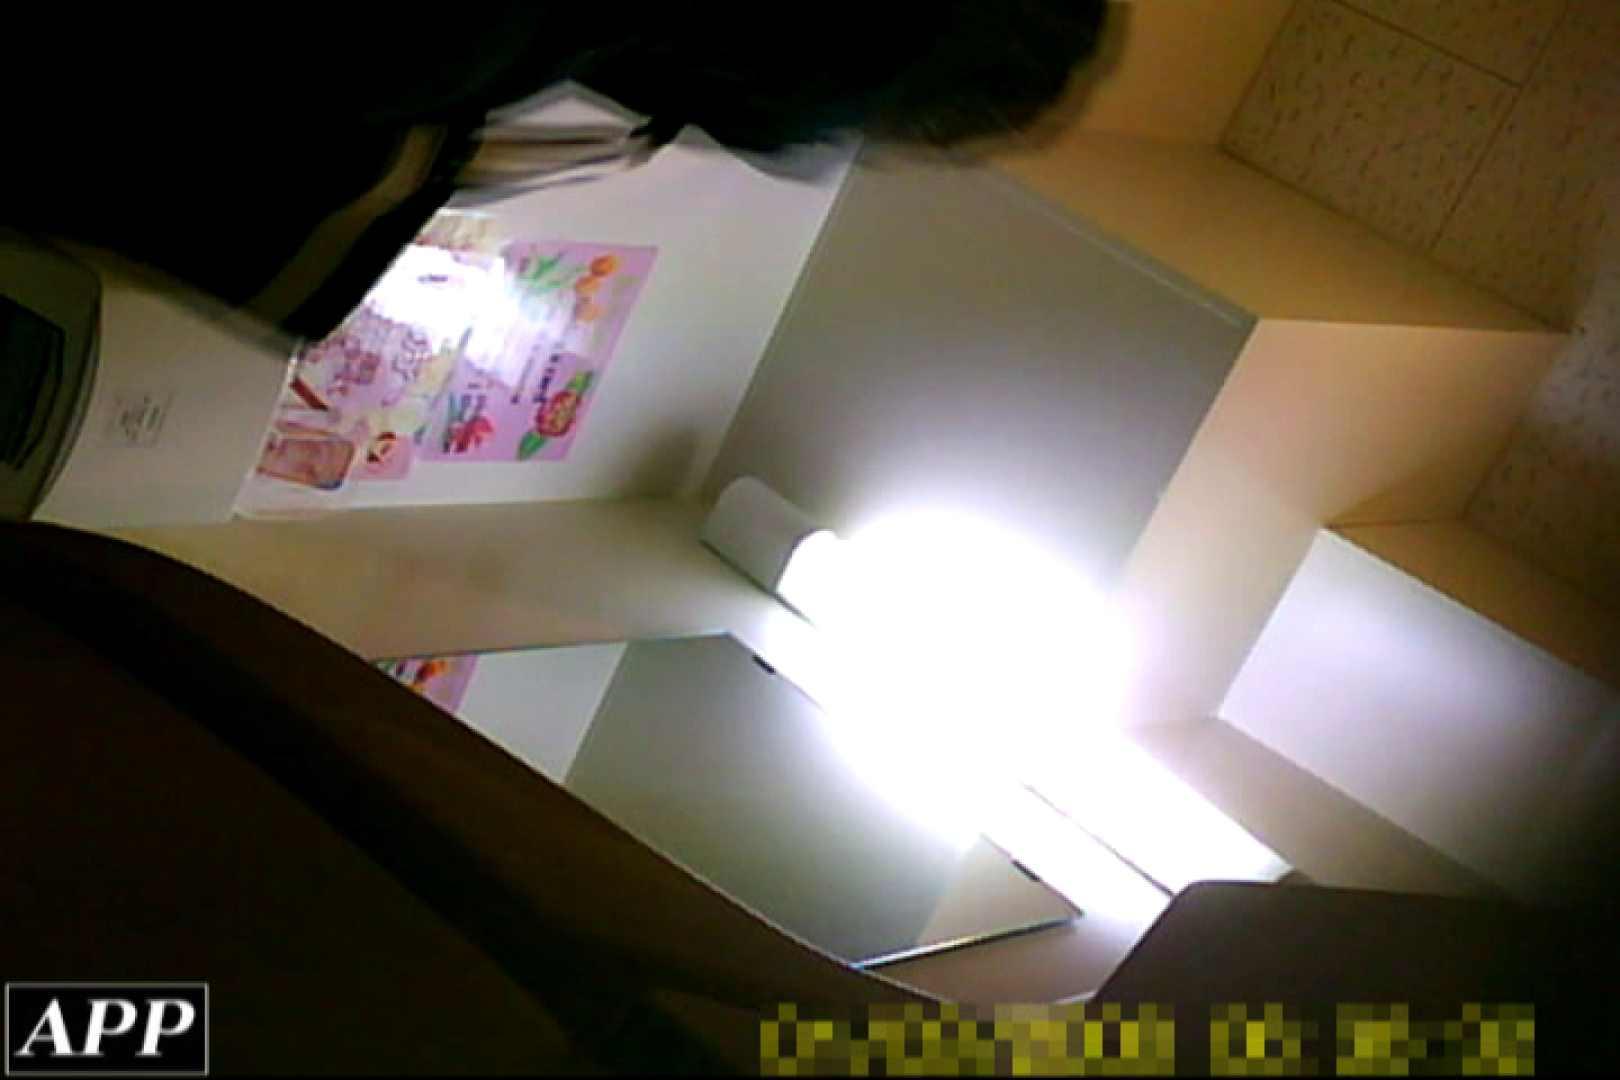 3視点洗面所 vol.121 OLハメ撮り  86Pix 86